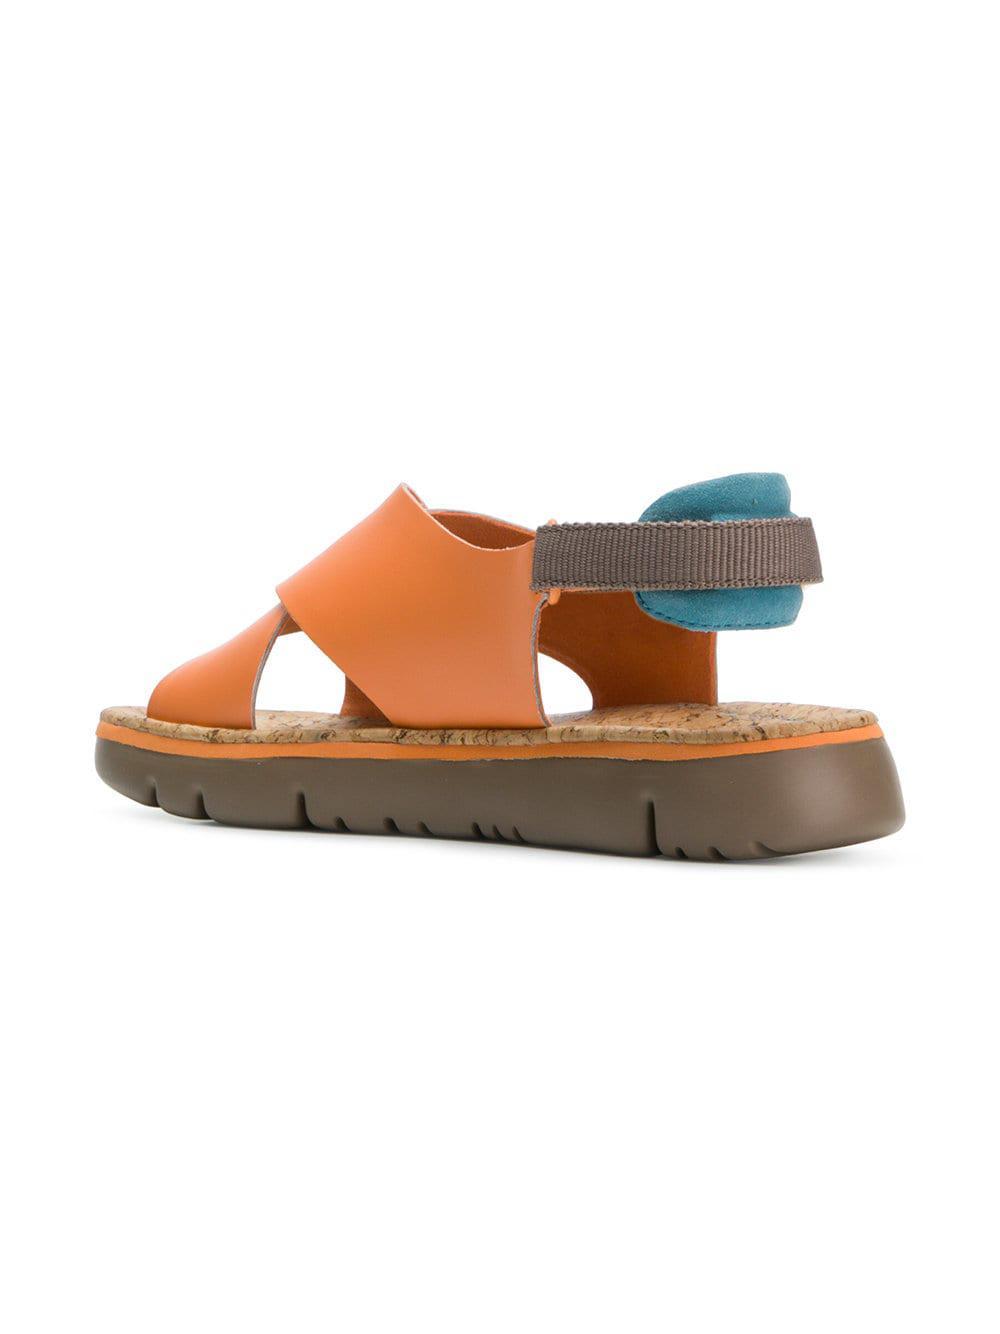 ab2525bd507 Lyst - Camper Oruga Sandals in Yellow